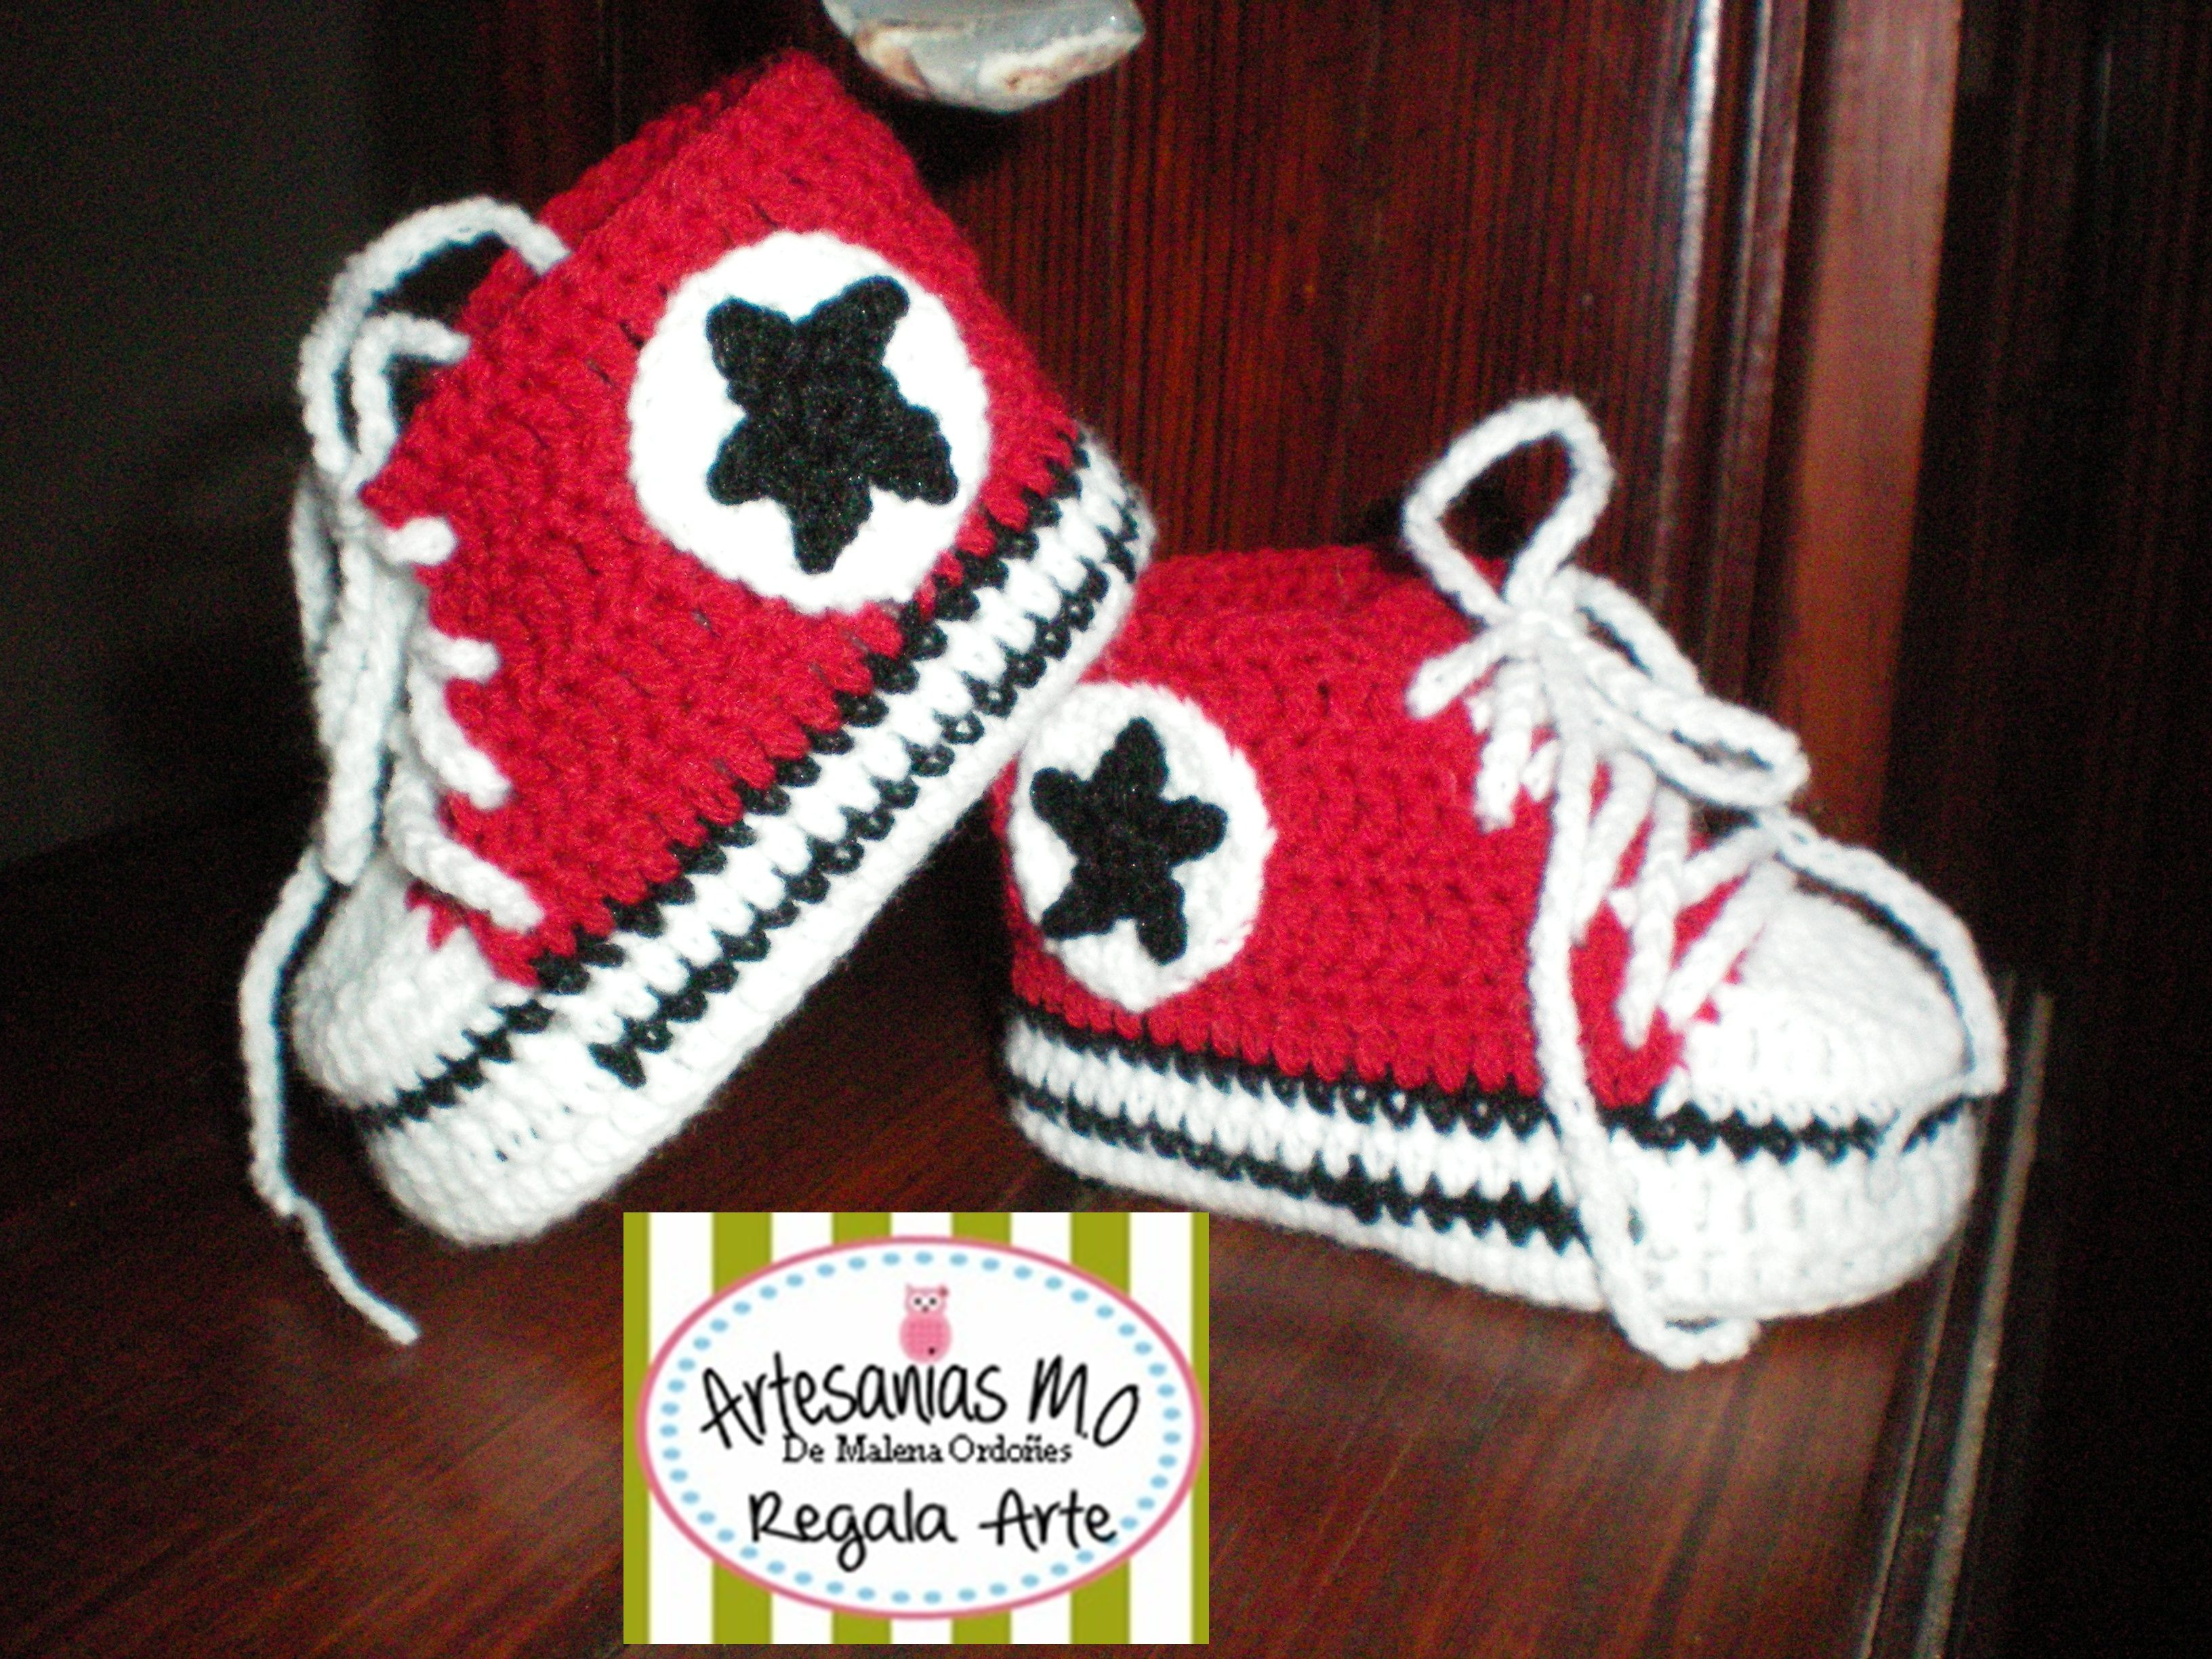 Zapas estilo converse tejidas a crochet para bebes!